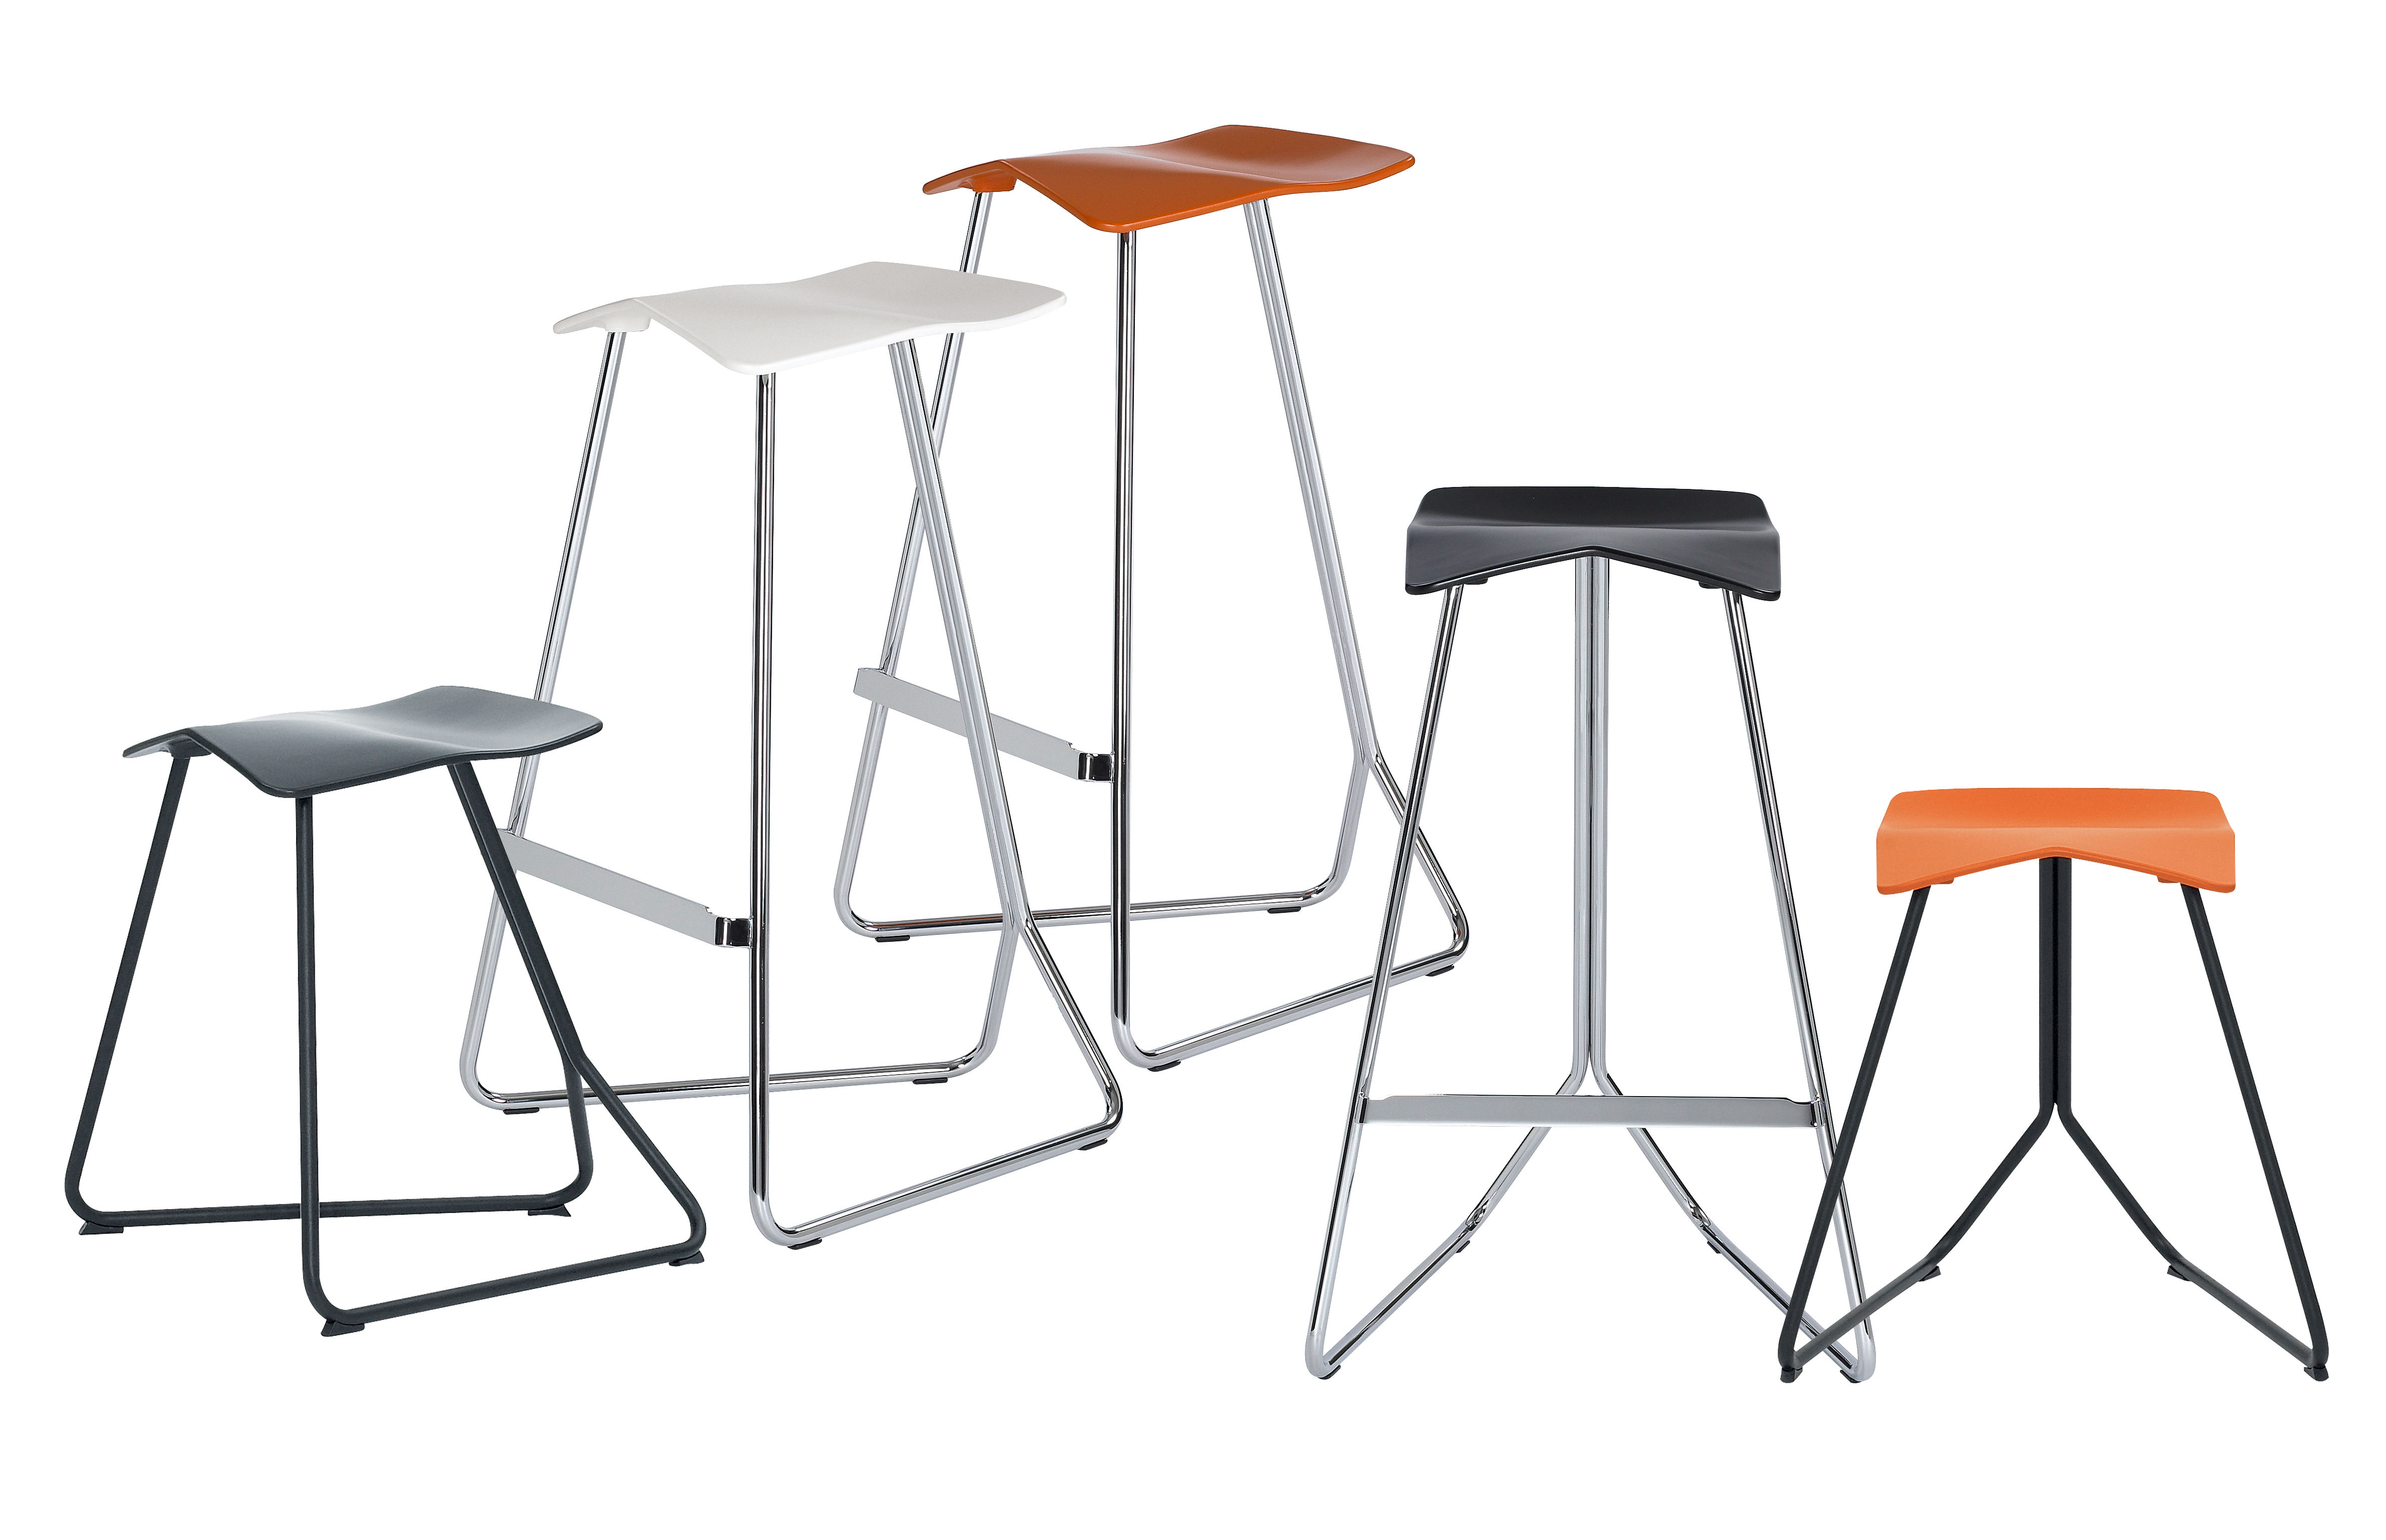 tabouret de bar triton h 74 cm assise plastique noir pied chrom classicon made in design. Black Bedroom Furniture Sets. Home Design Ideas